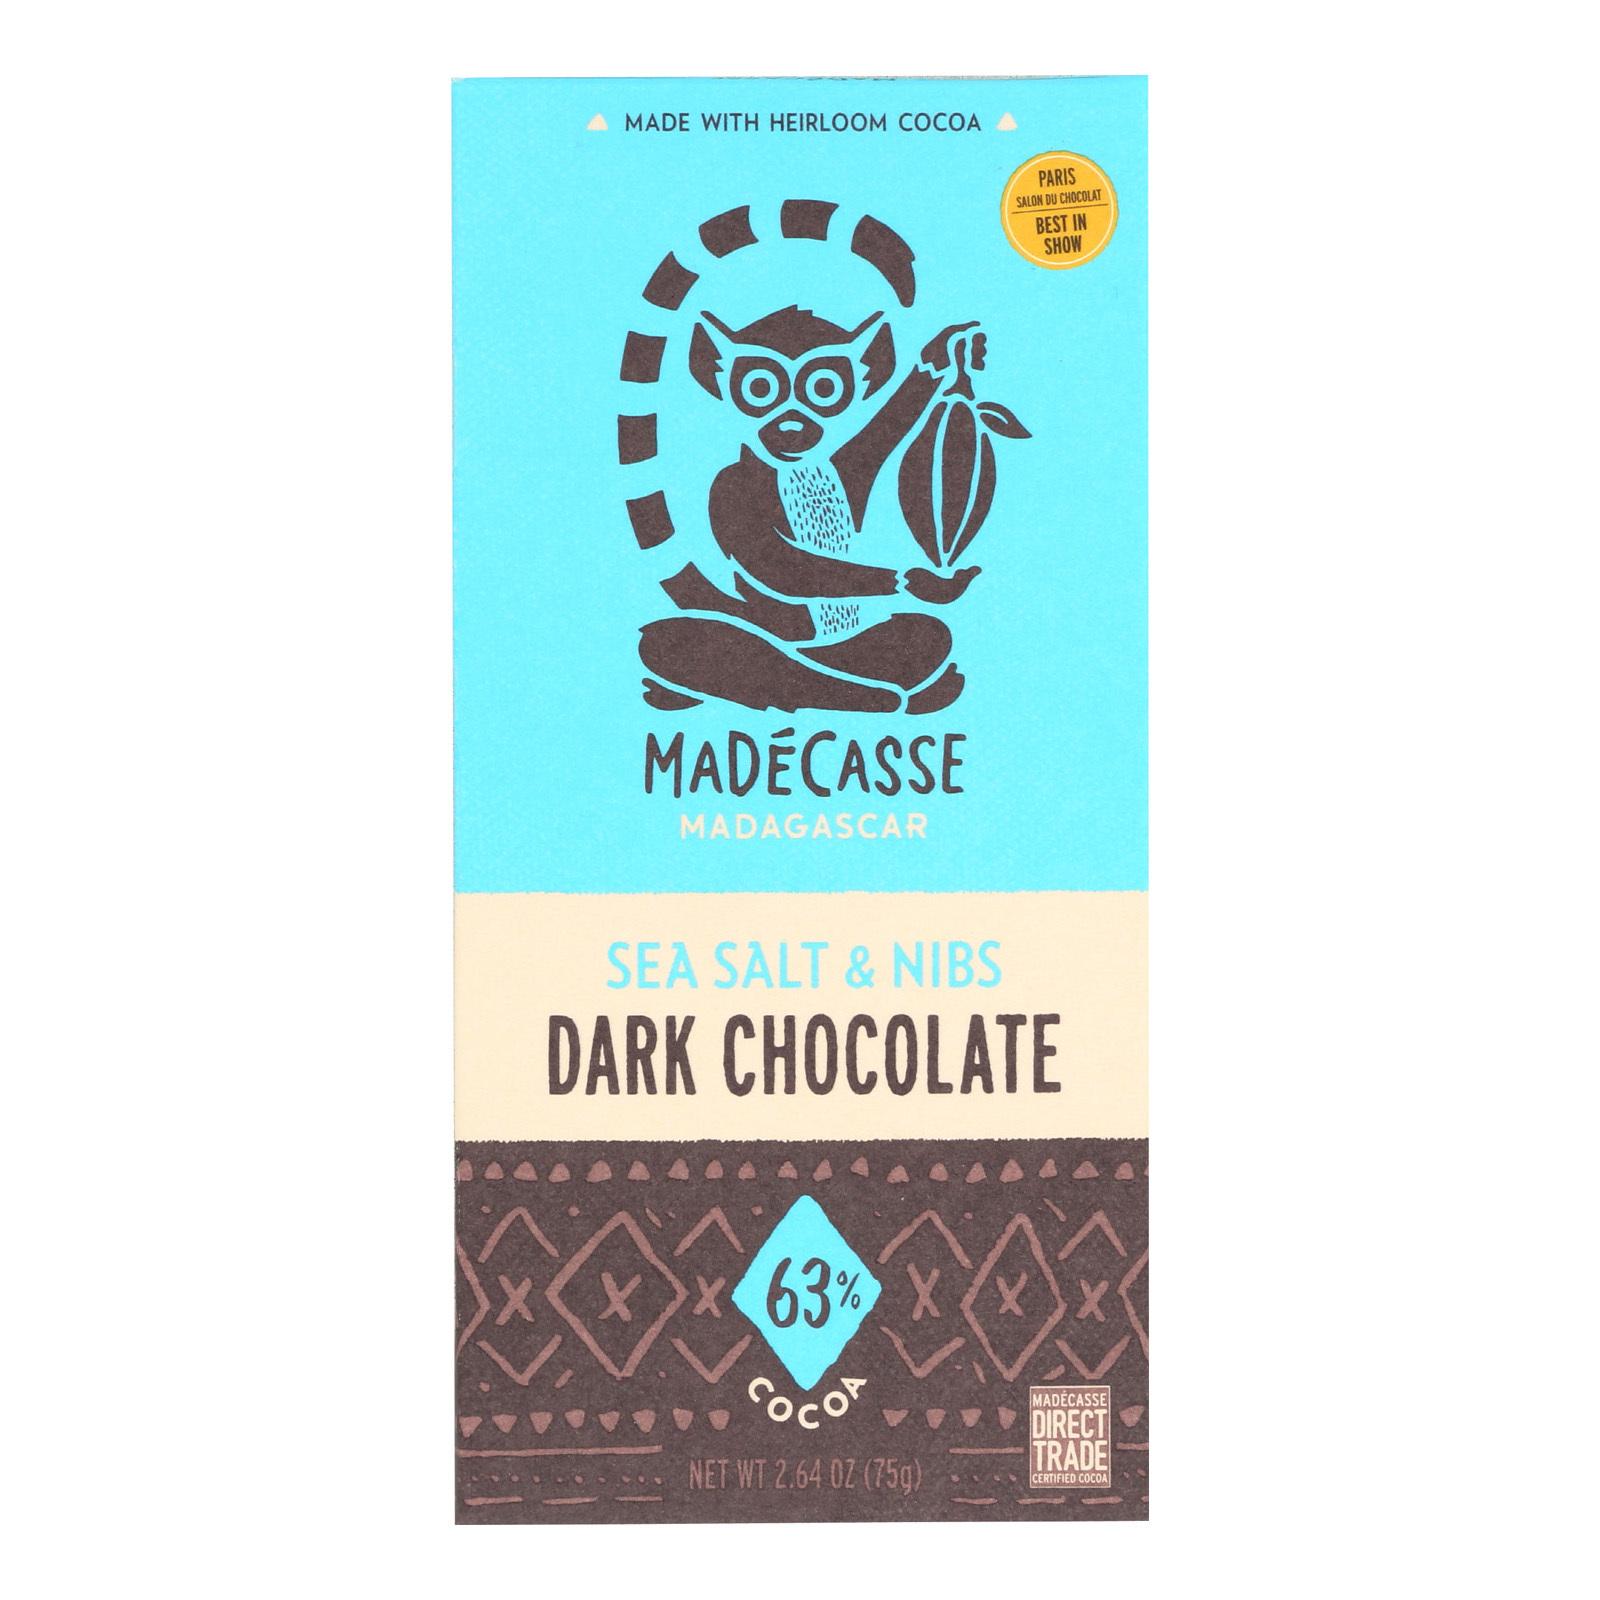 Madecasse Chocolate Bars - 63 Percent Dark Chocolate - Sea Salt and Nibs - 2.64 oz Bars - Case of 10